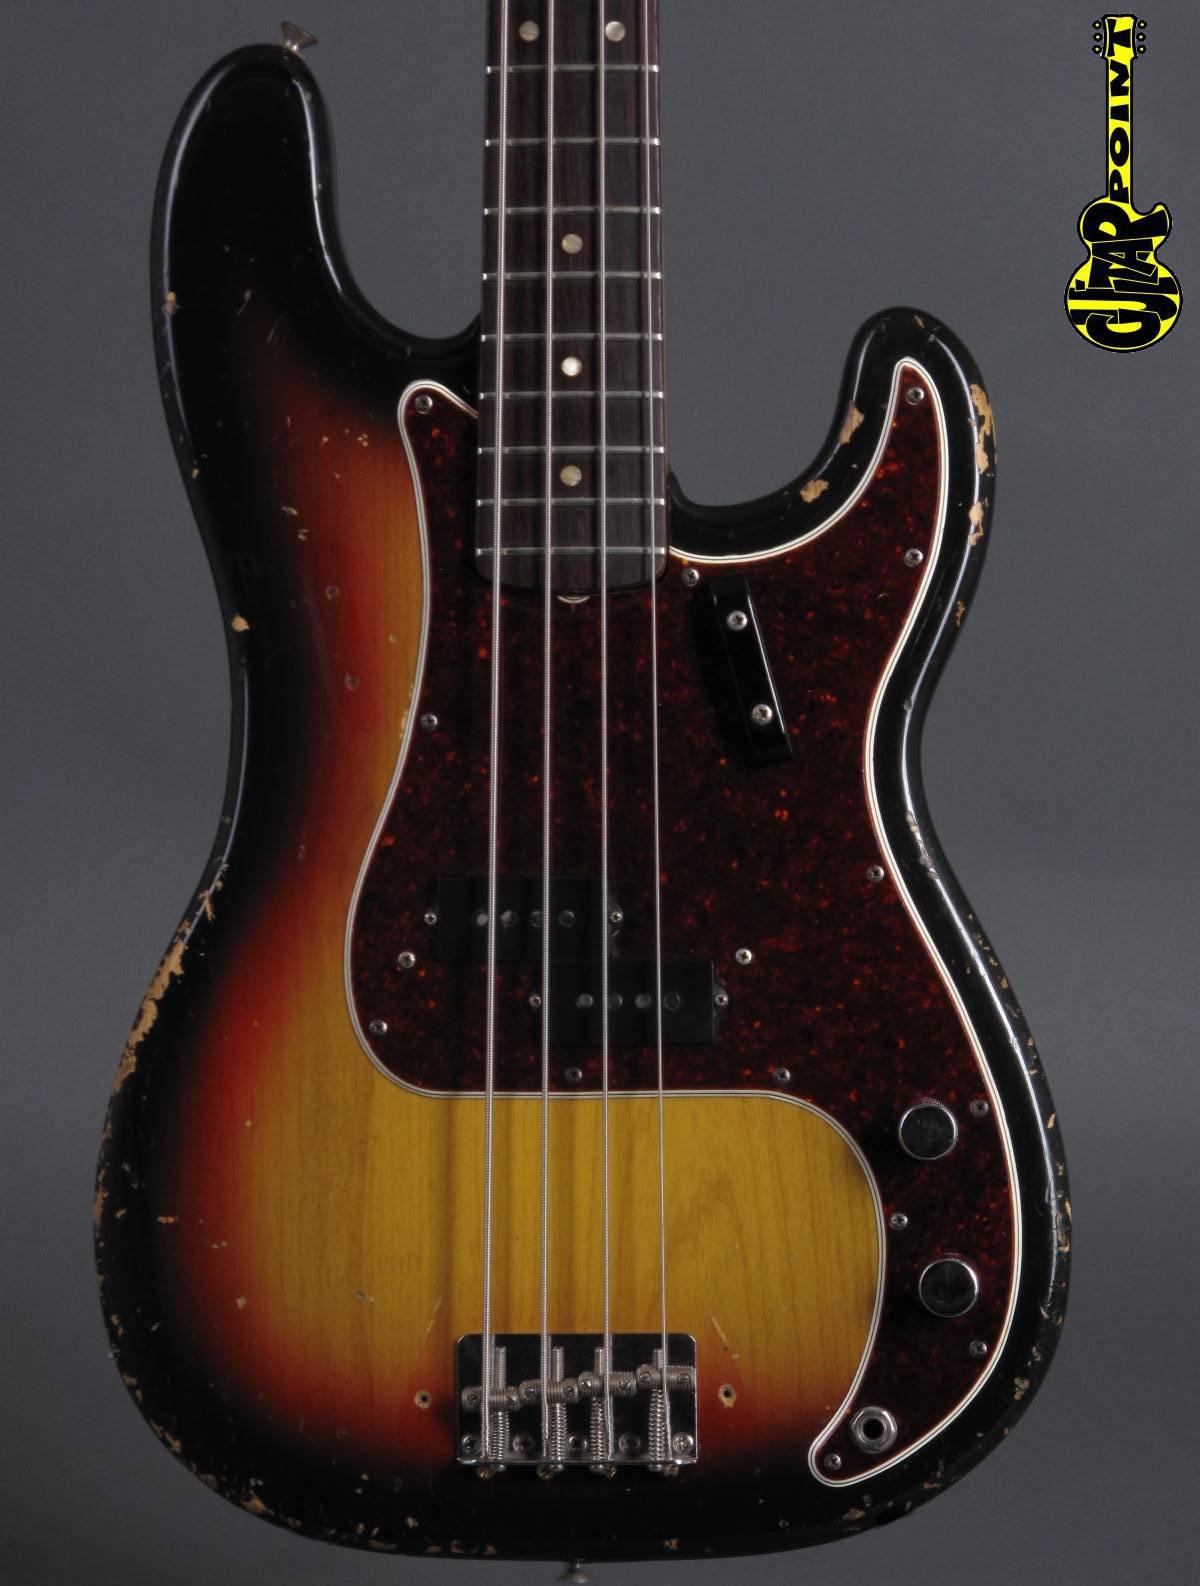 1966 Fender Precision Bass - 3-tone Sunburst